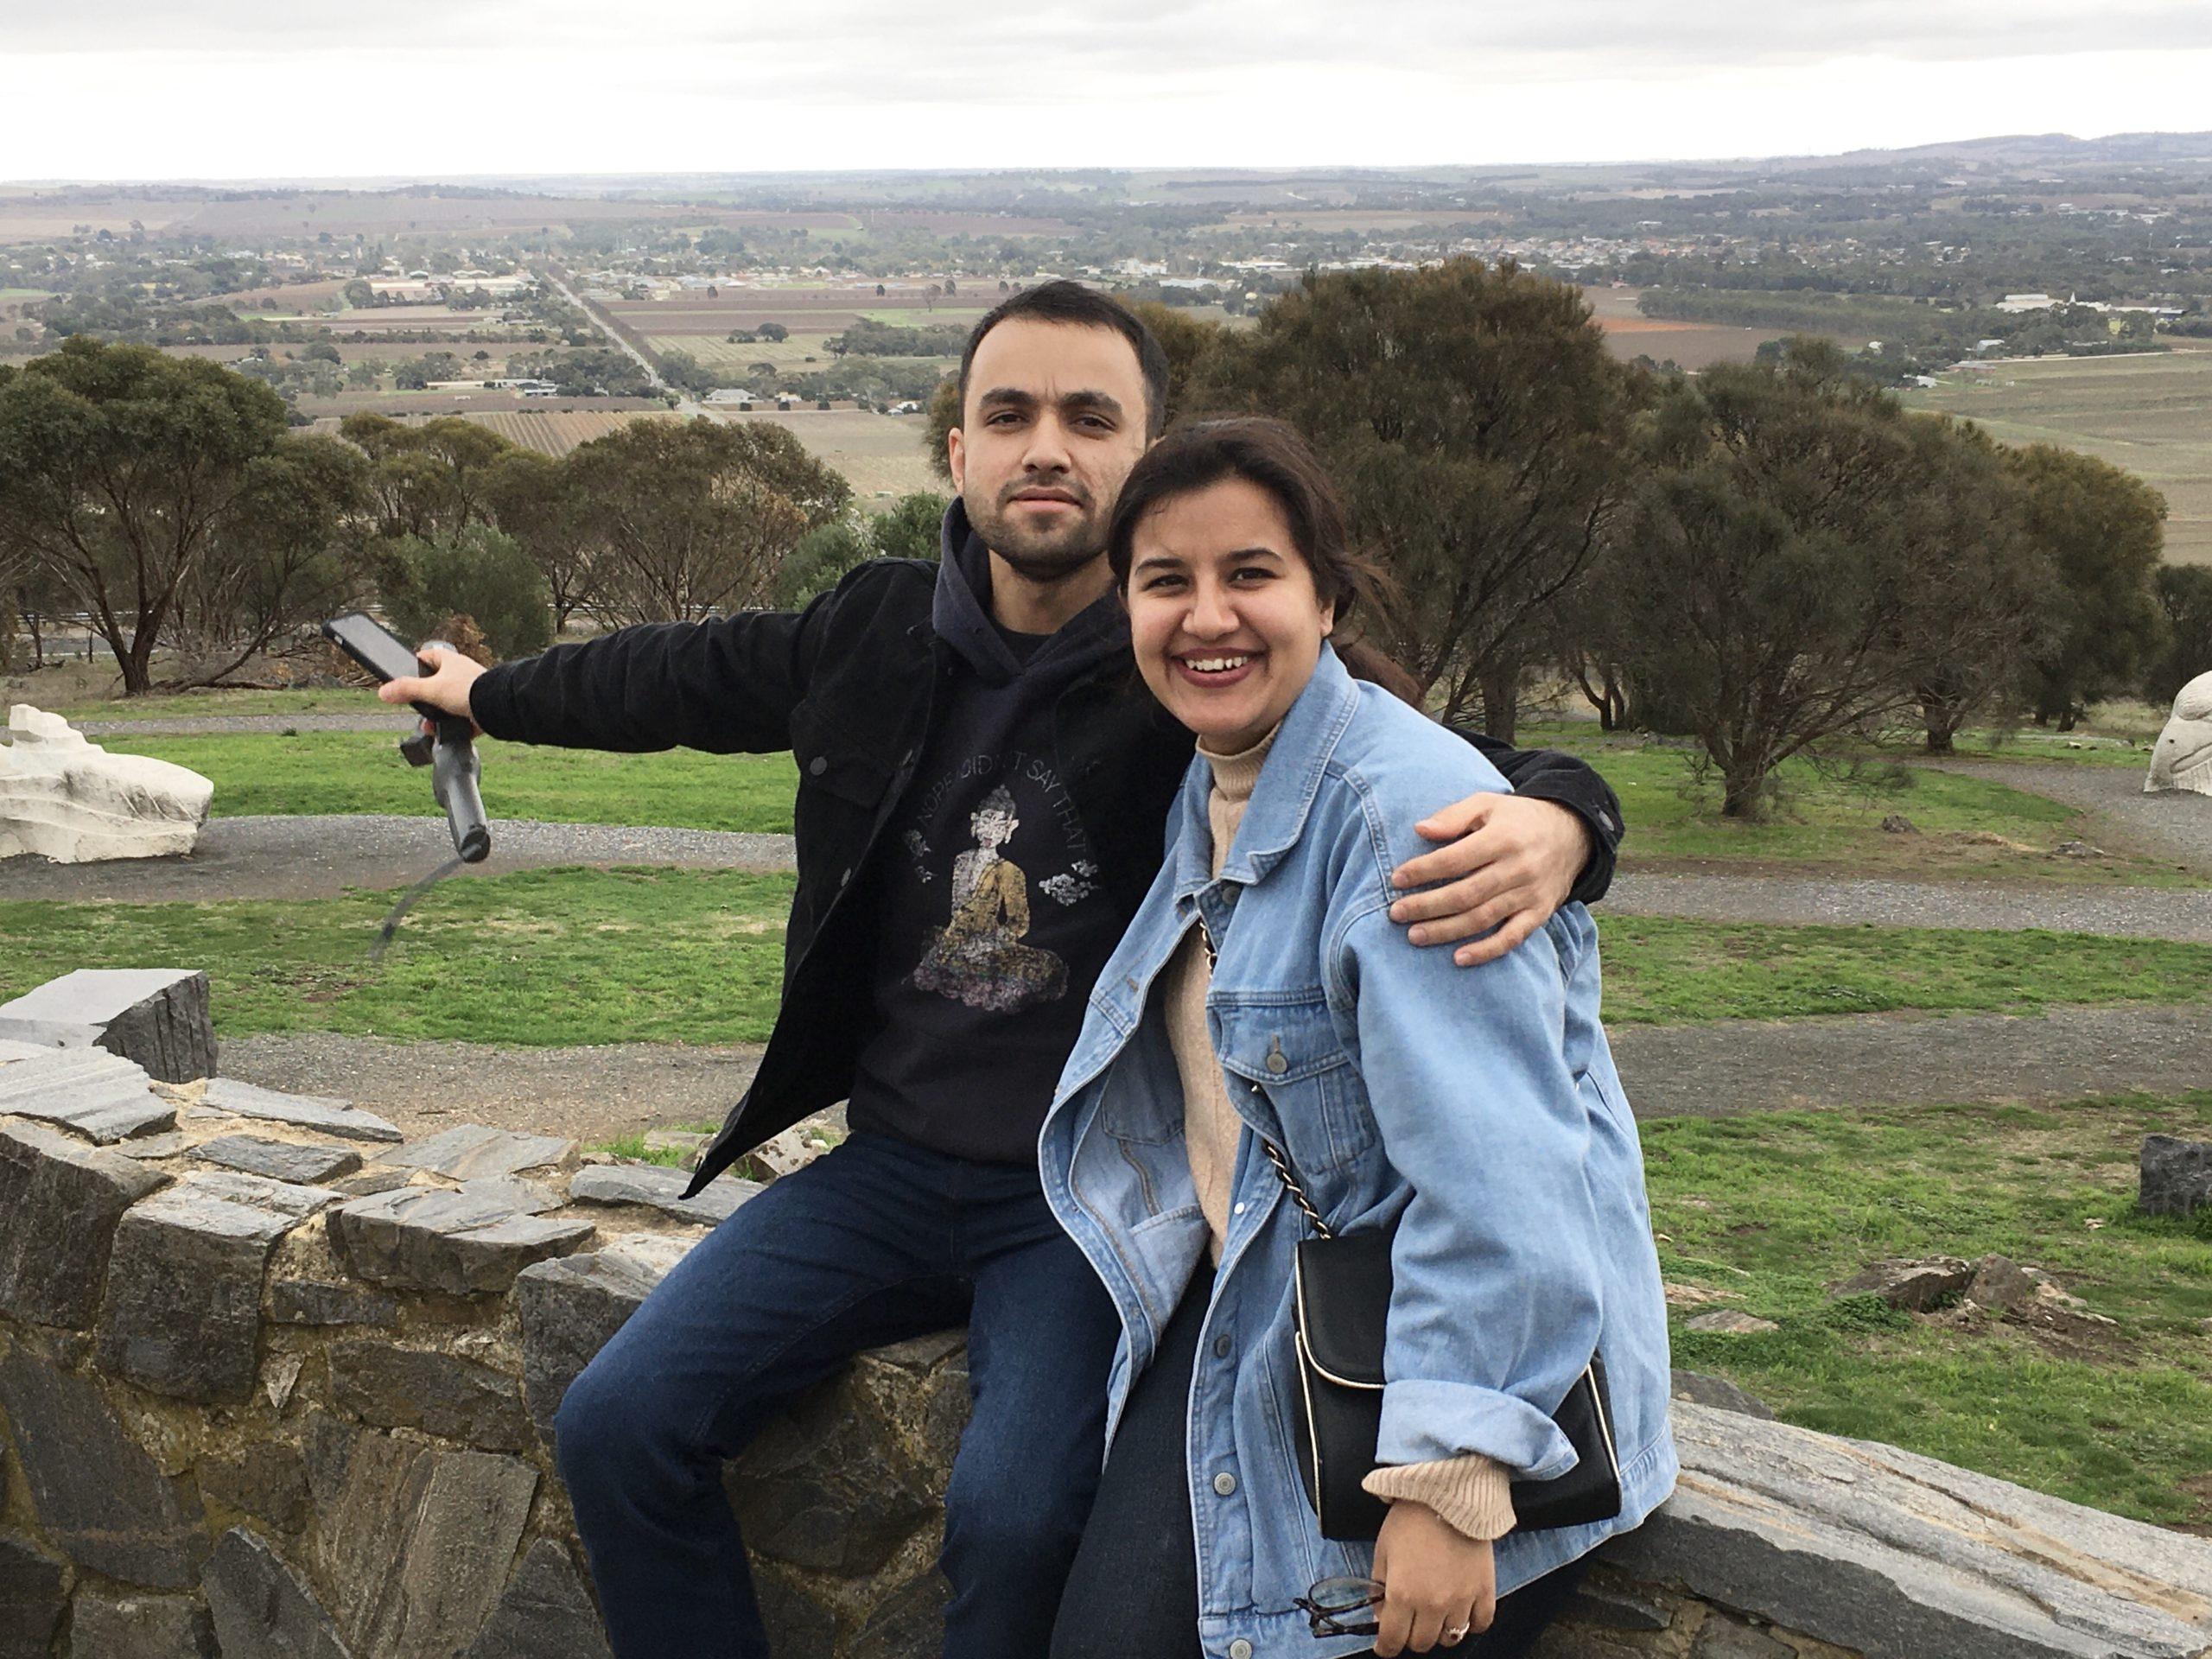 mengler lookout barossa valley south australia